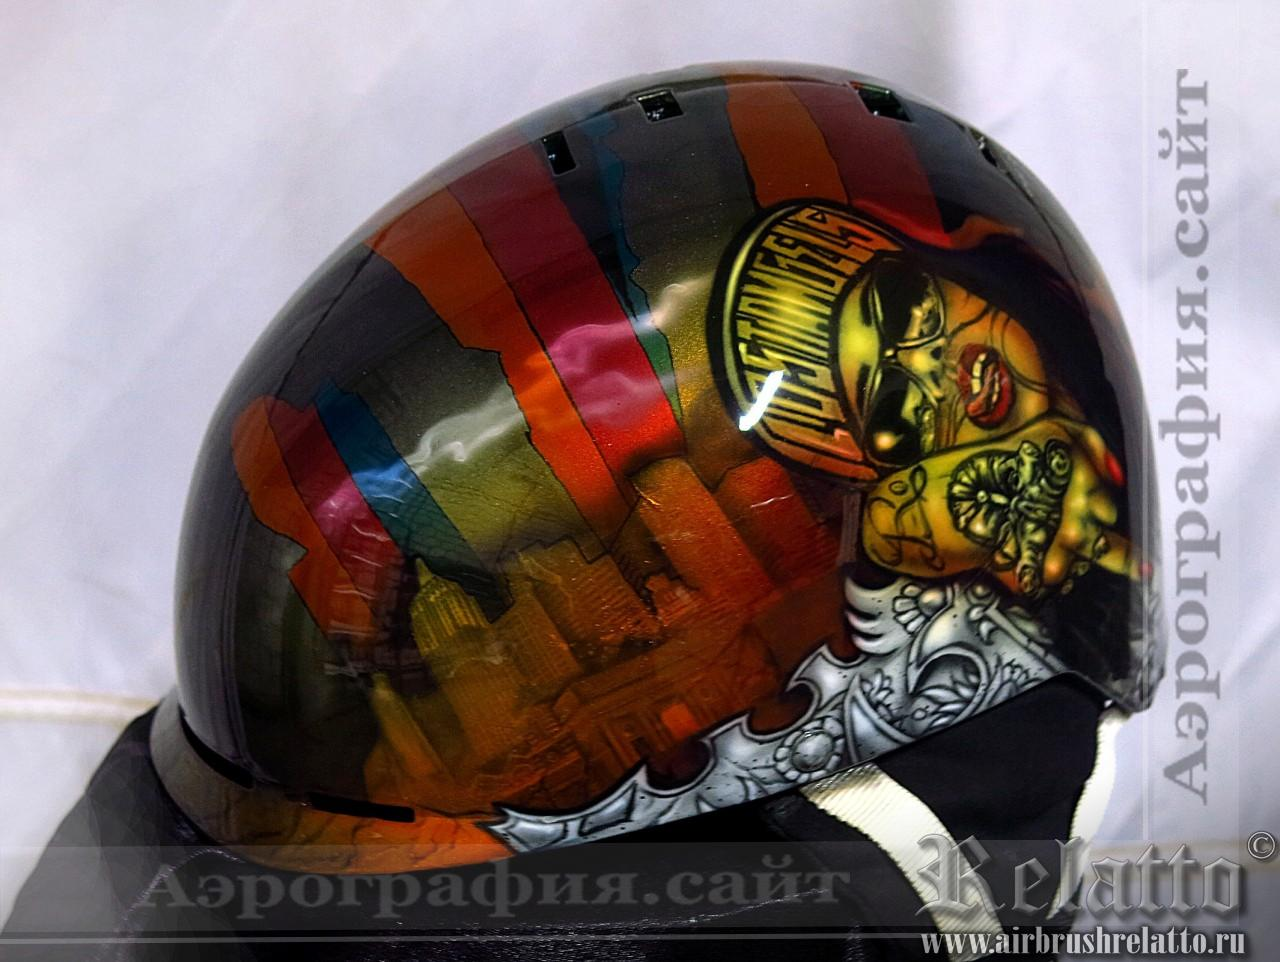 Airbrush snowbord helmet